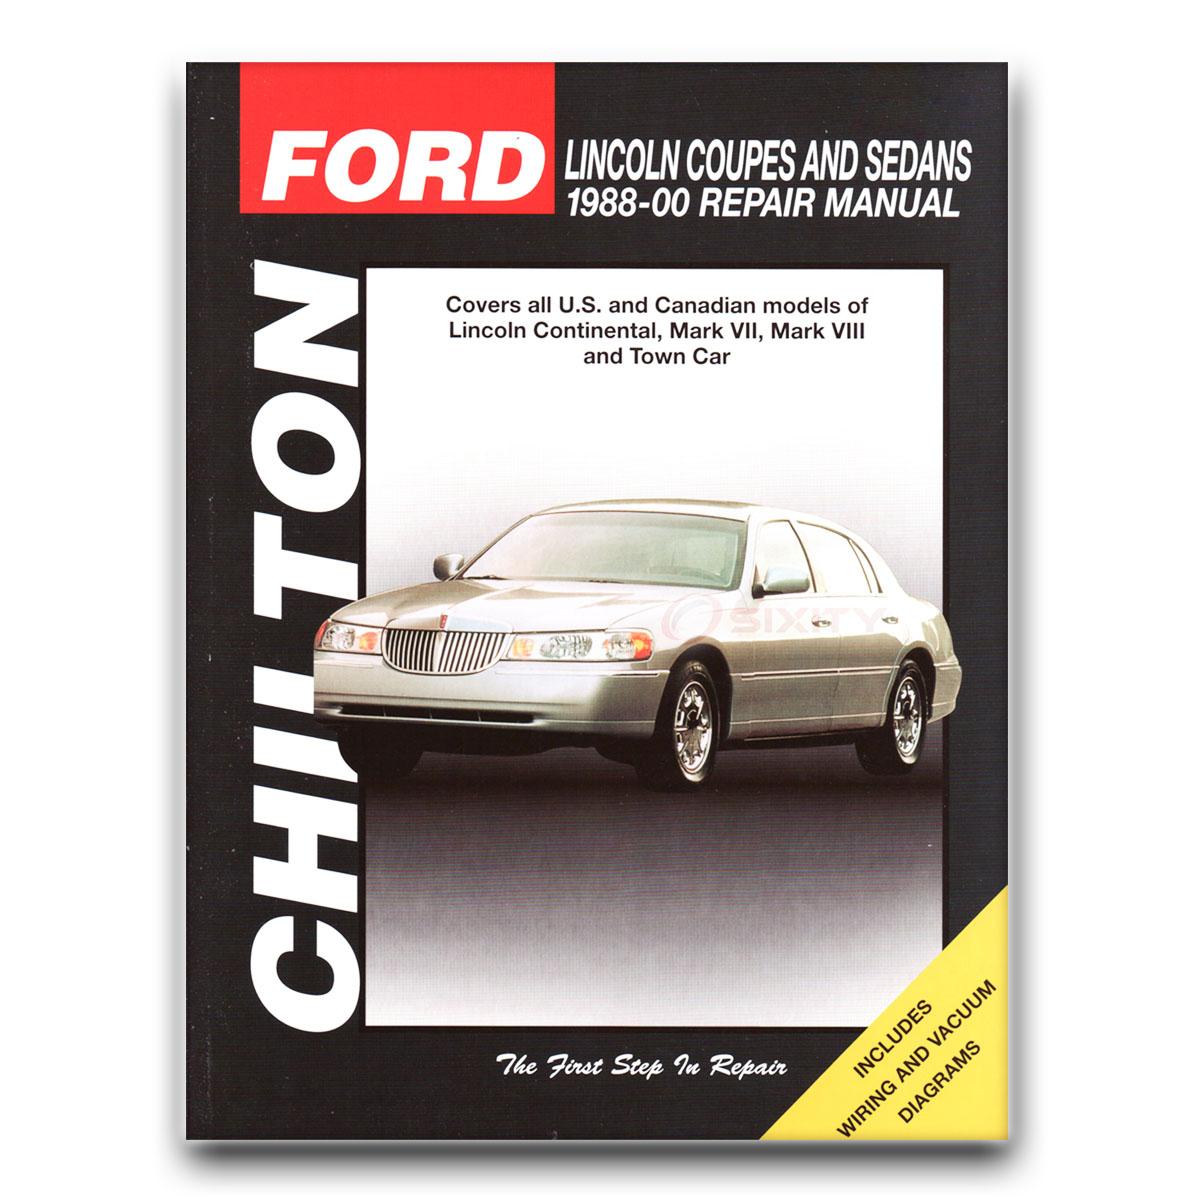 Lincoln Continental Chilton Repair Manual Spinnaker Edition Signature Base  bt